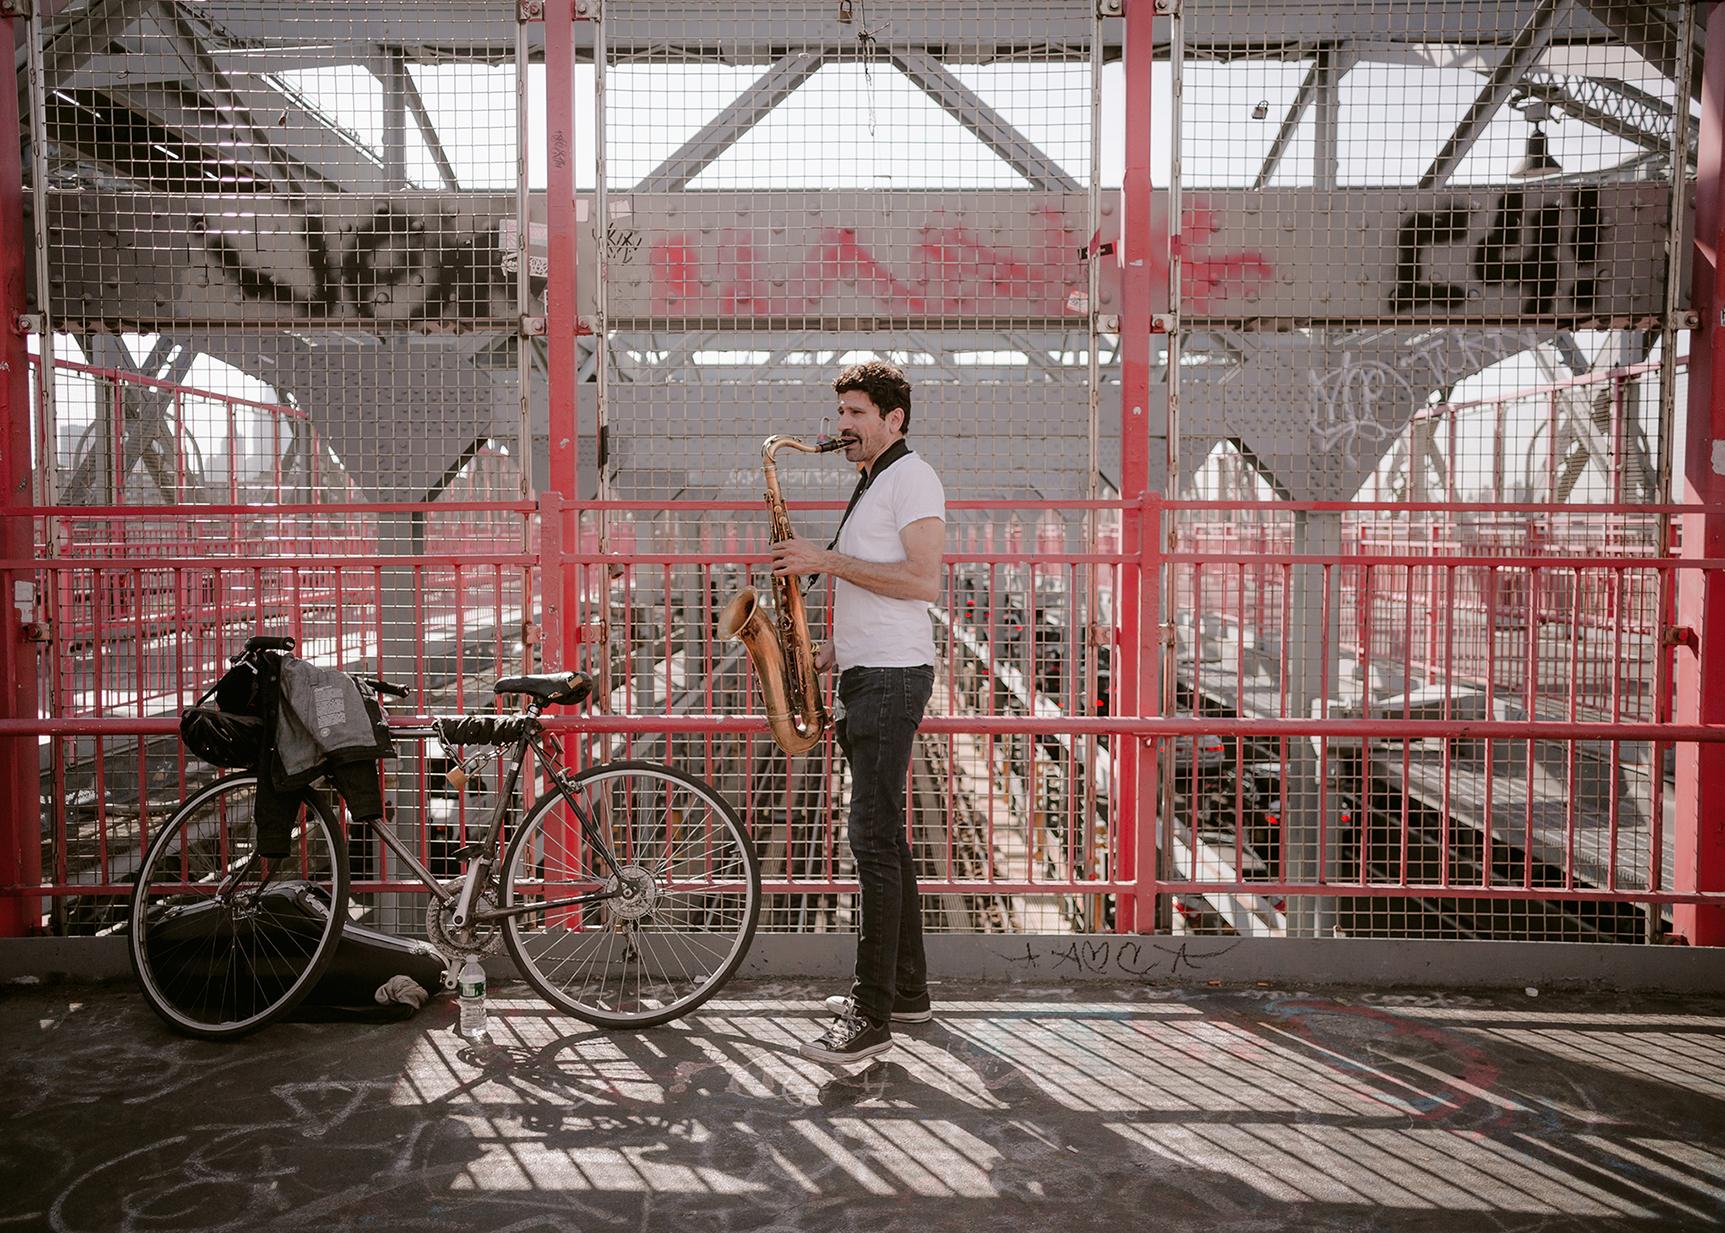 jonathan-burkhart-photographer-oklahoma-city-street-photography-newy-york-city1.jpg